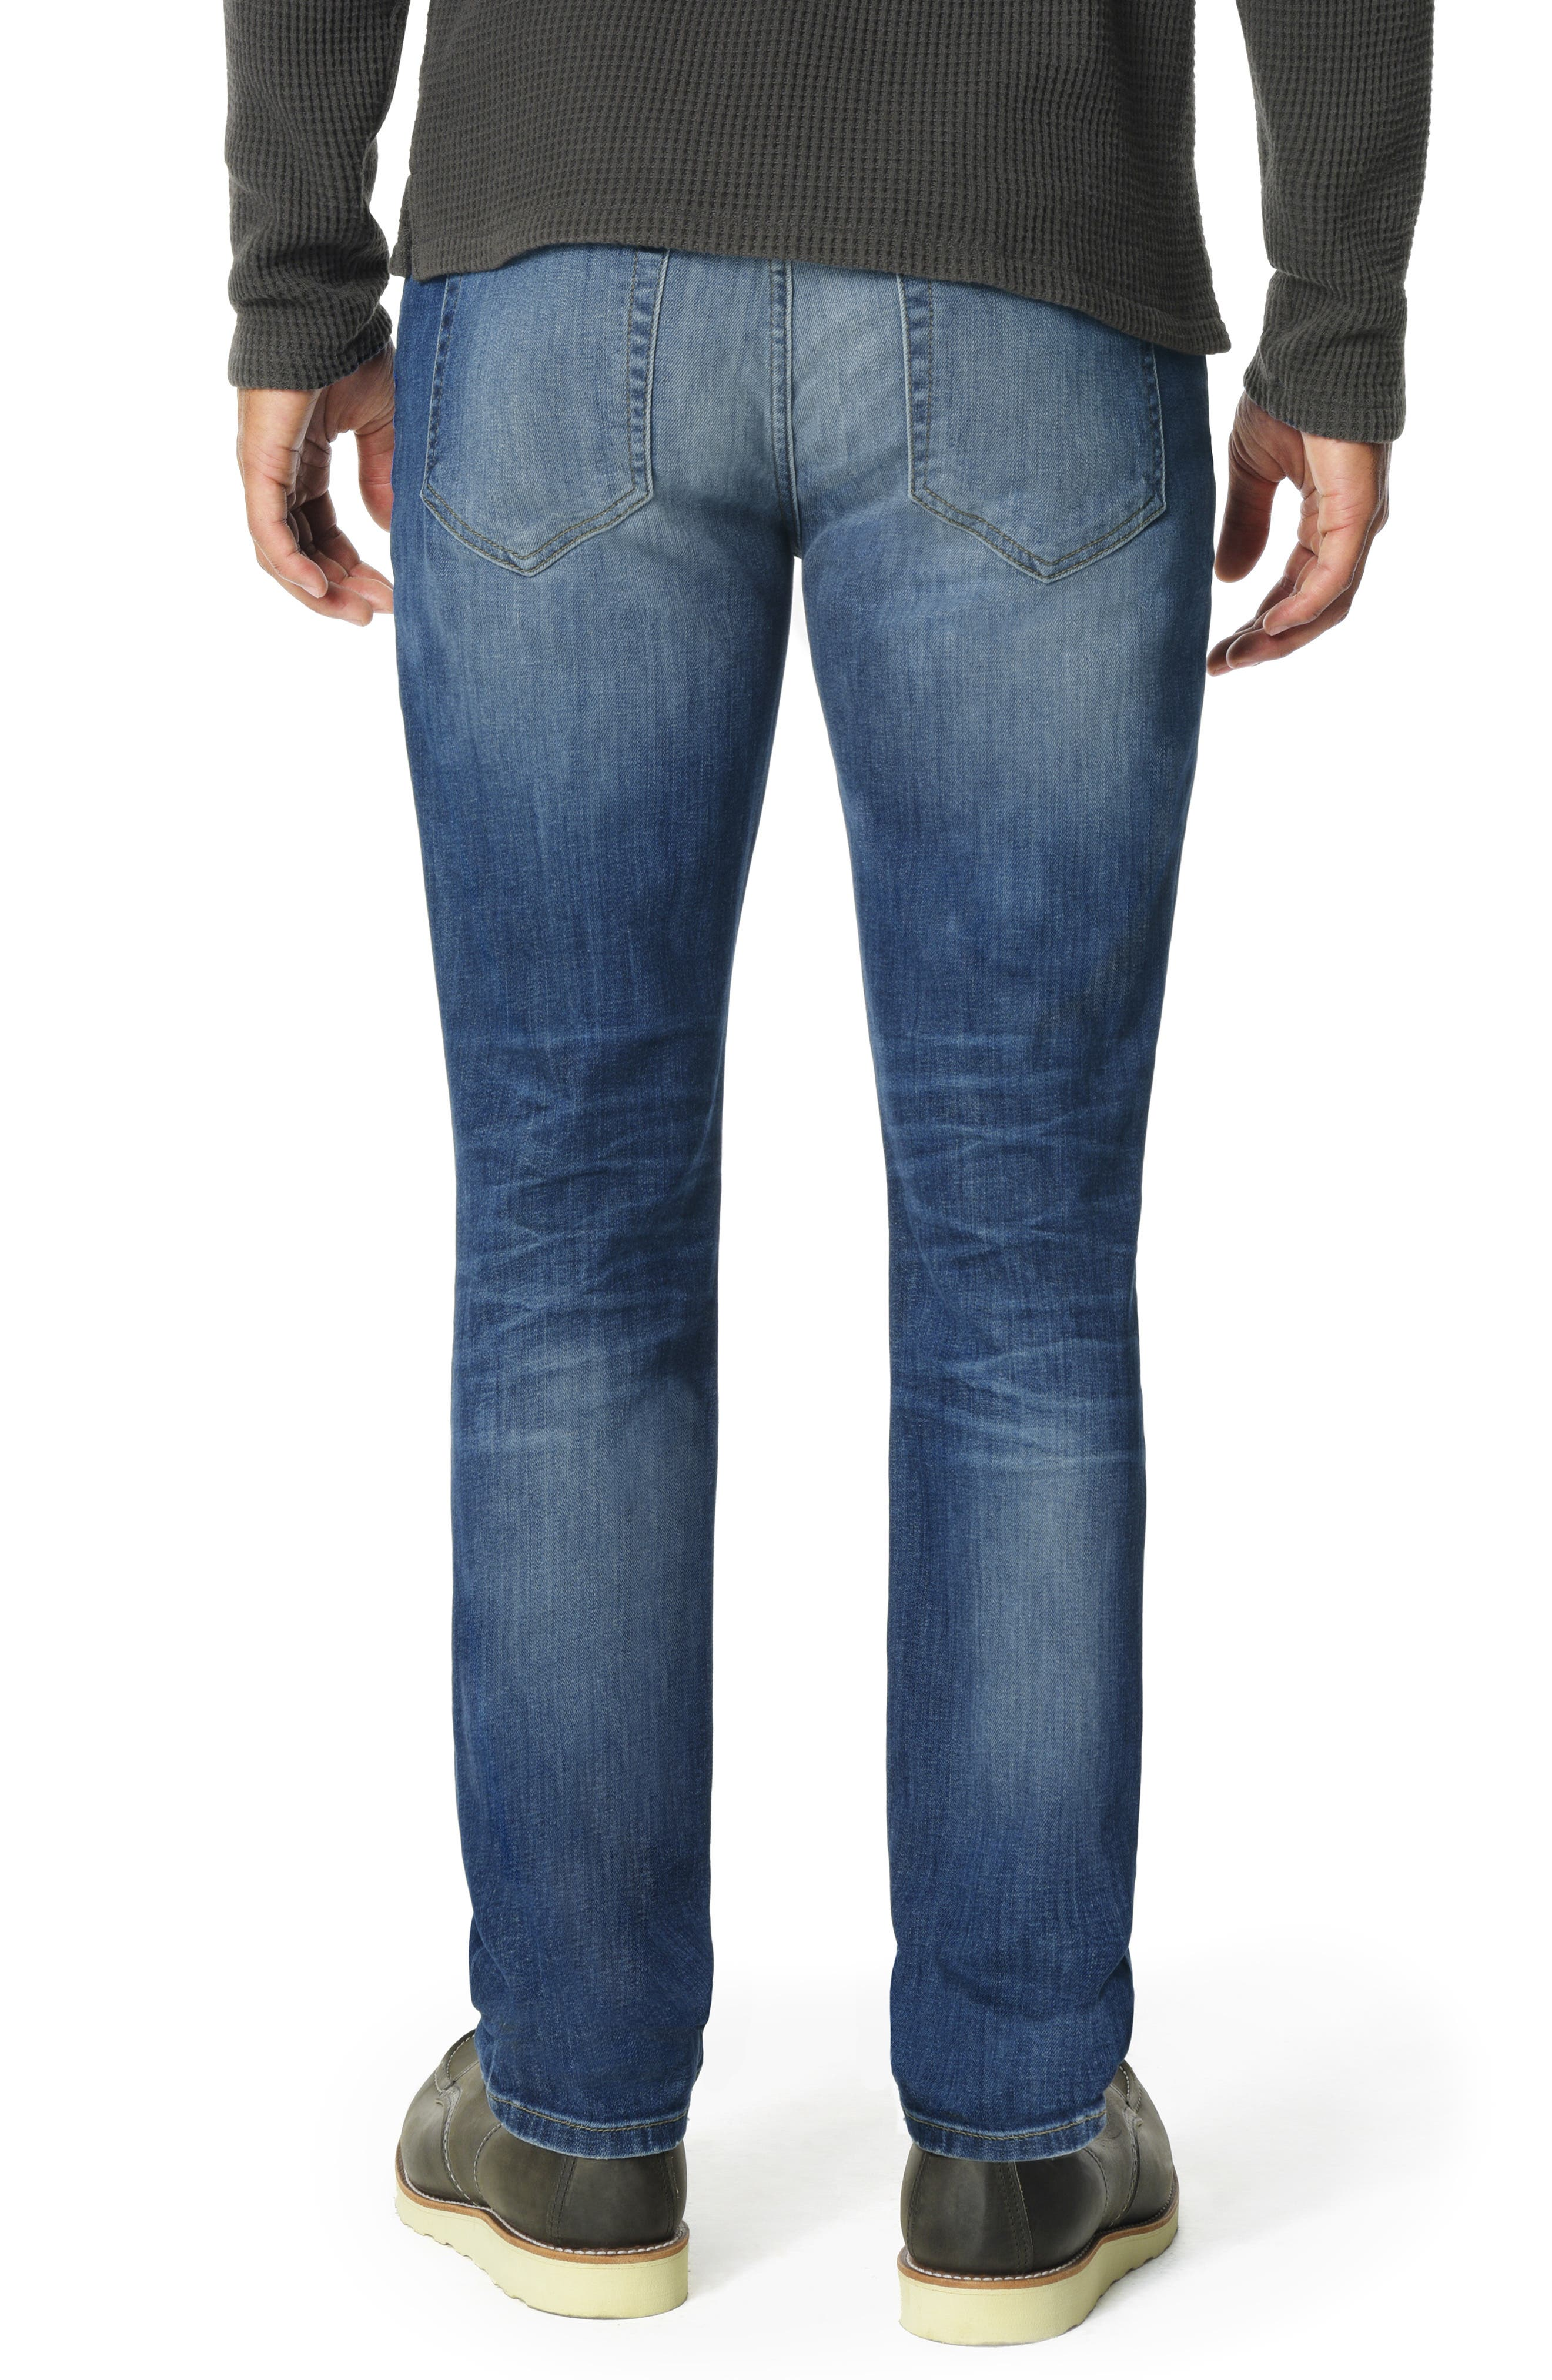 JOE'S,                             Brixton Slim Straight Leg Jeans,                             Alternate thumbnail 2, color,                             HOYT